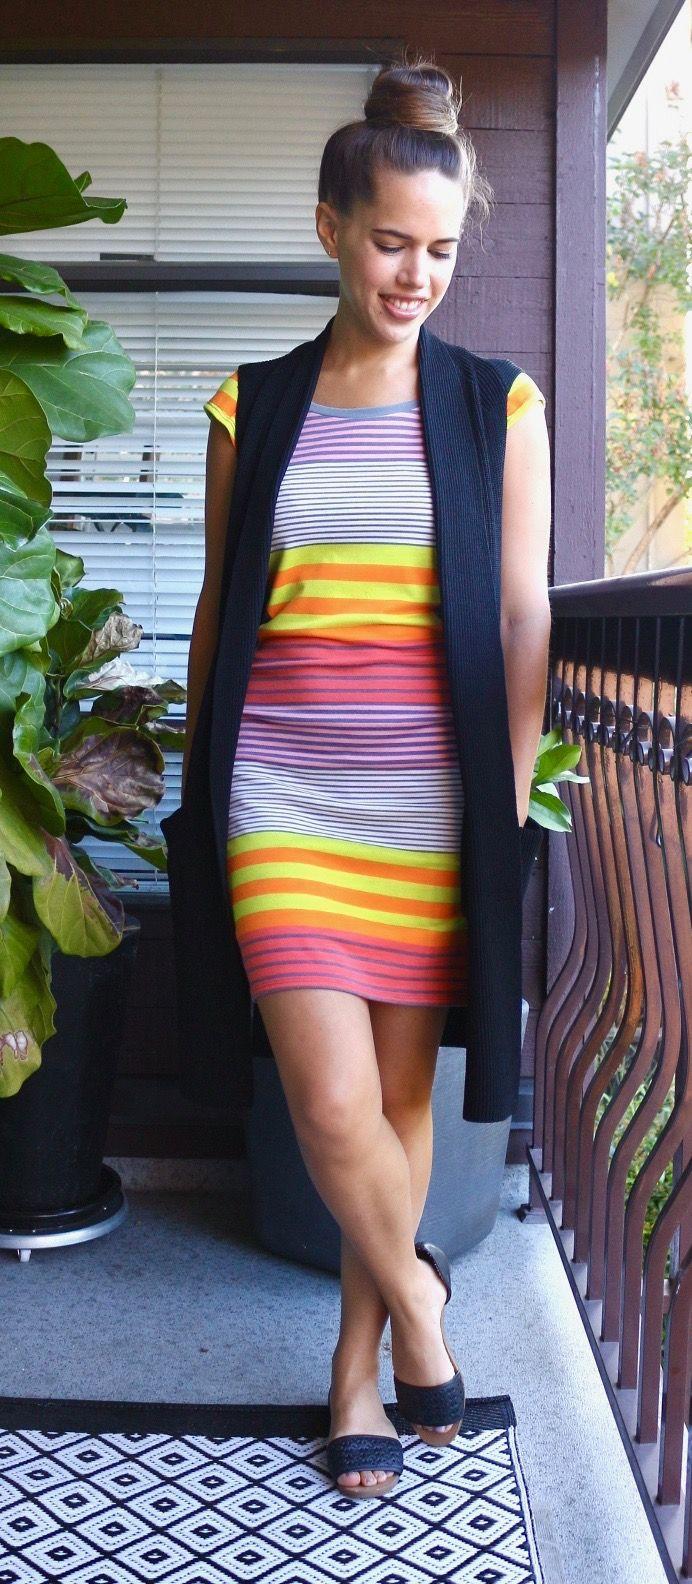 Jules in Flats - Target Striped T-Shirt Dress with Artizia Dunkirk Sweater Vest